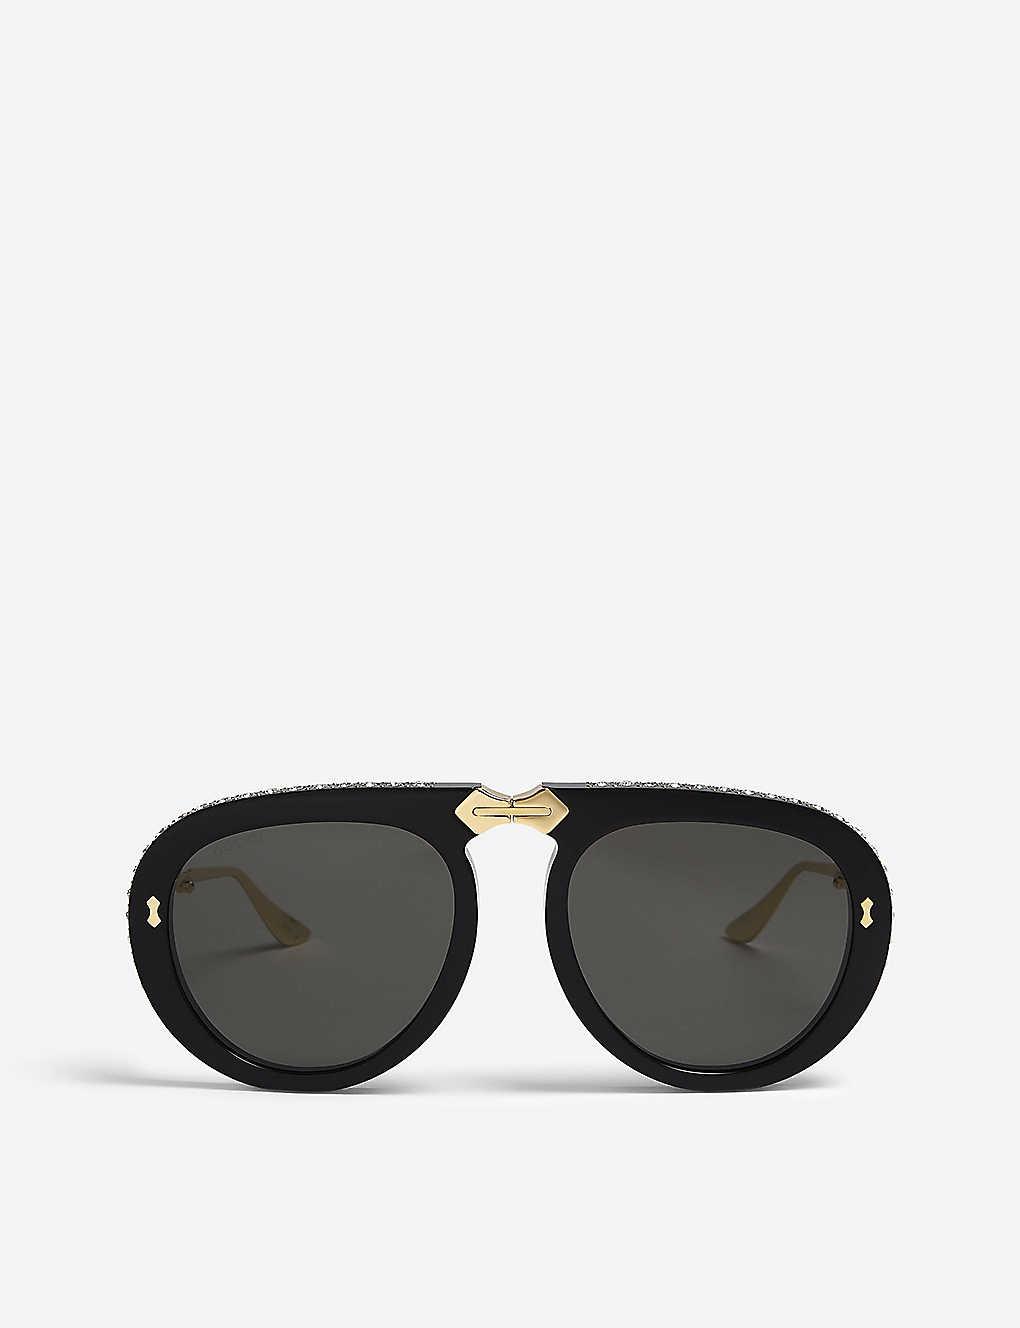 4b31a4b6326 GG0307s pilot-frame foldable sunglasses - Gold ...